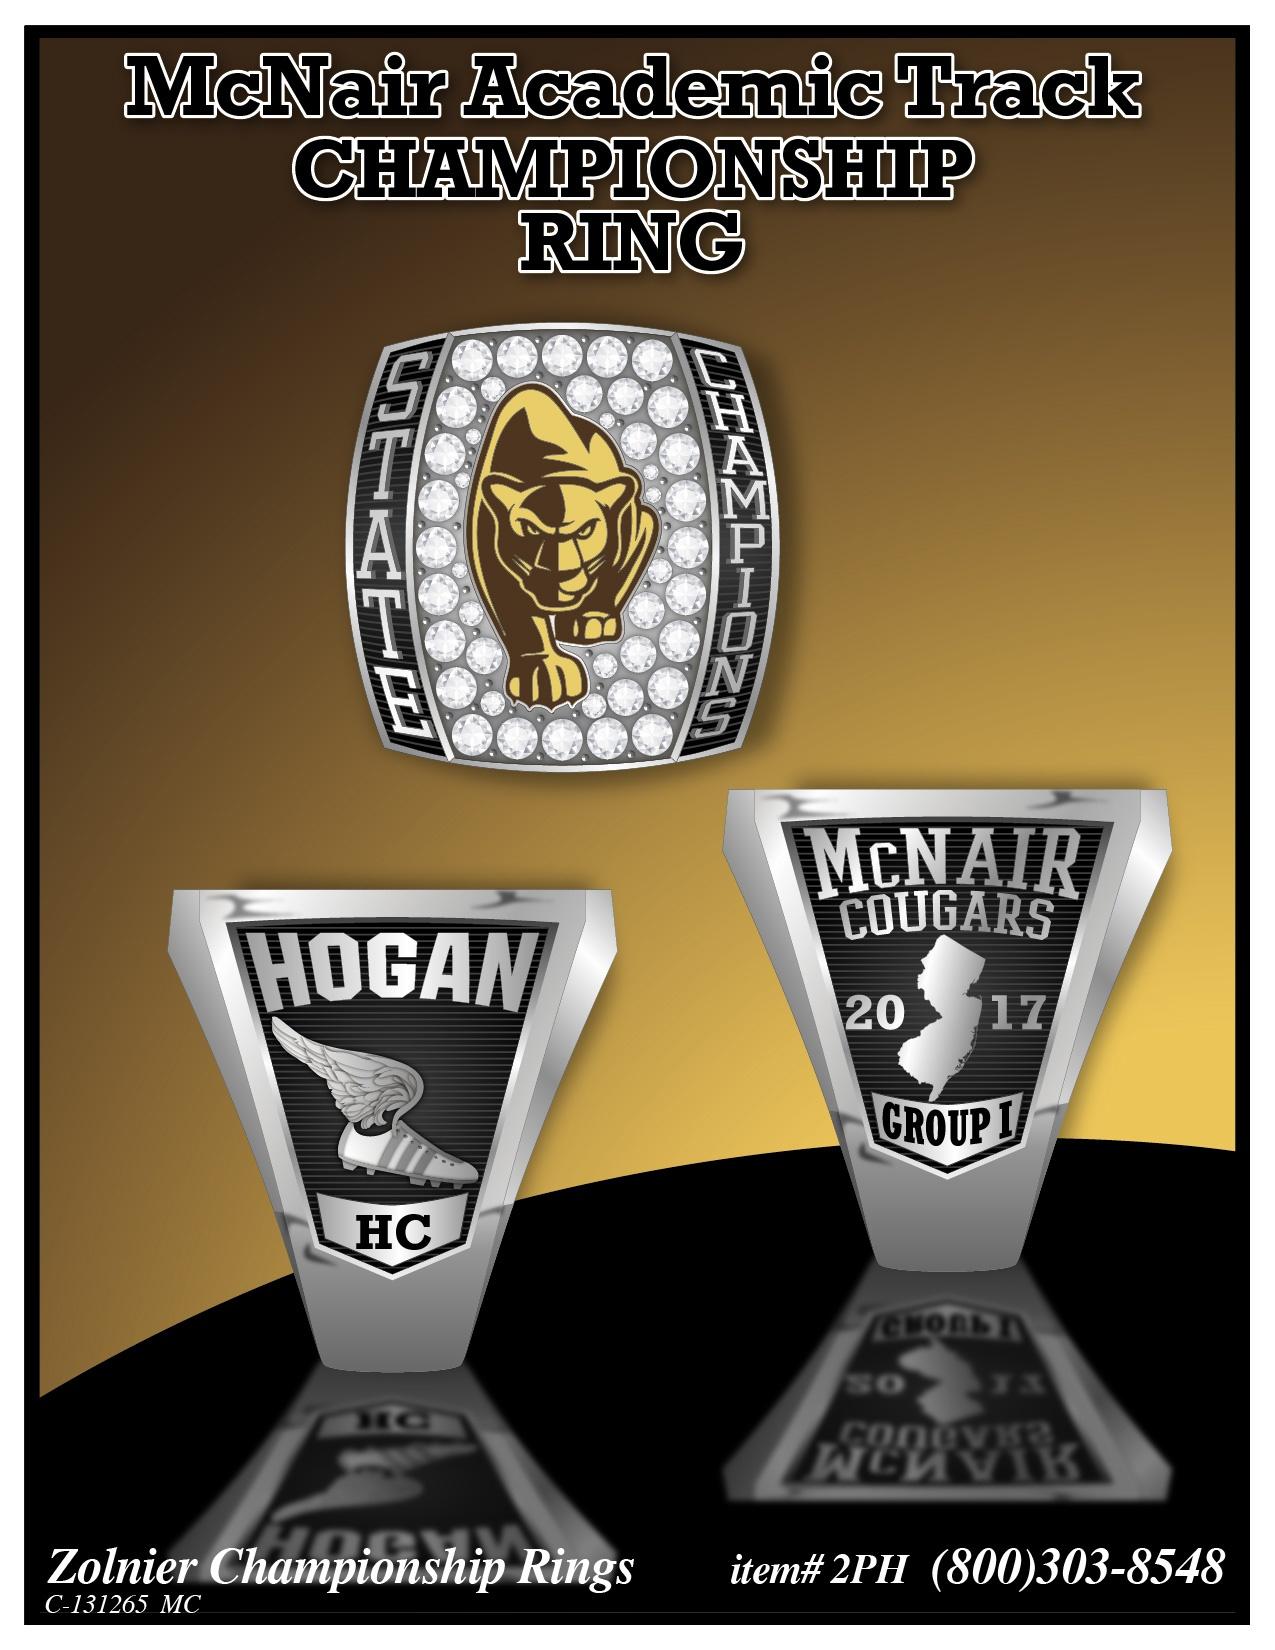 C-131265 McNair Track Championship Ring